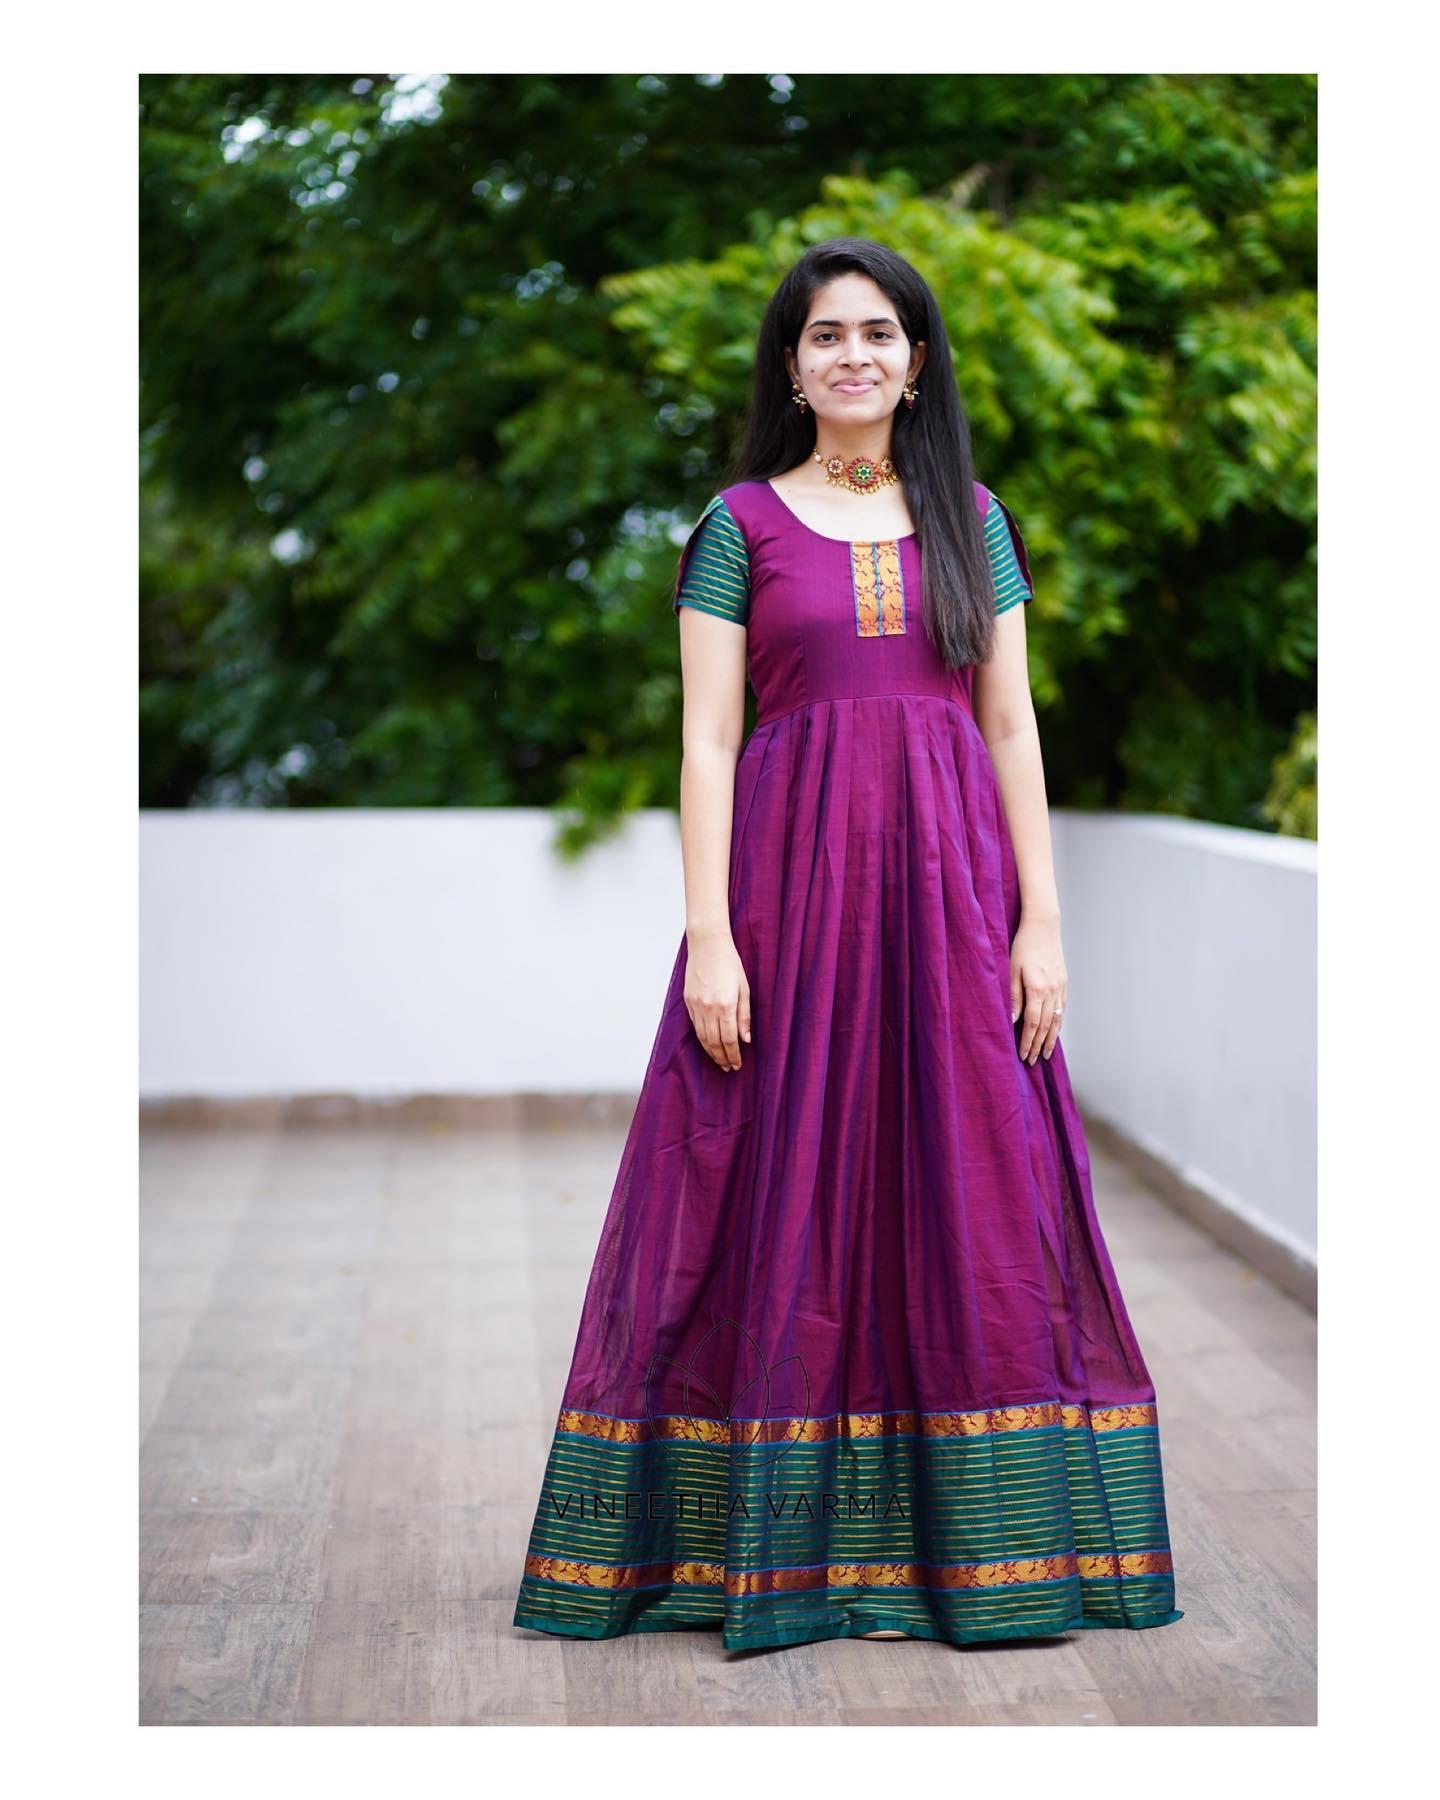 Narayanpet handloom maxi  composed with  peacock zari border. Price : ₹3800.00/- 2021-09-08